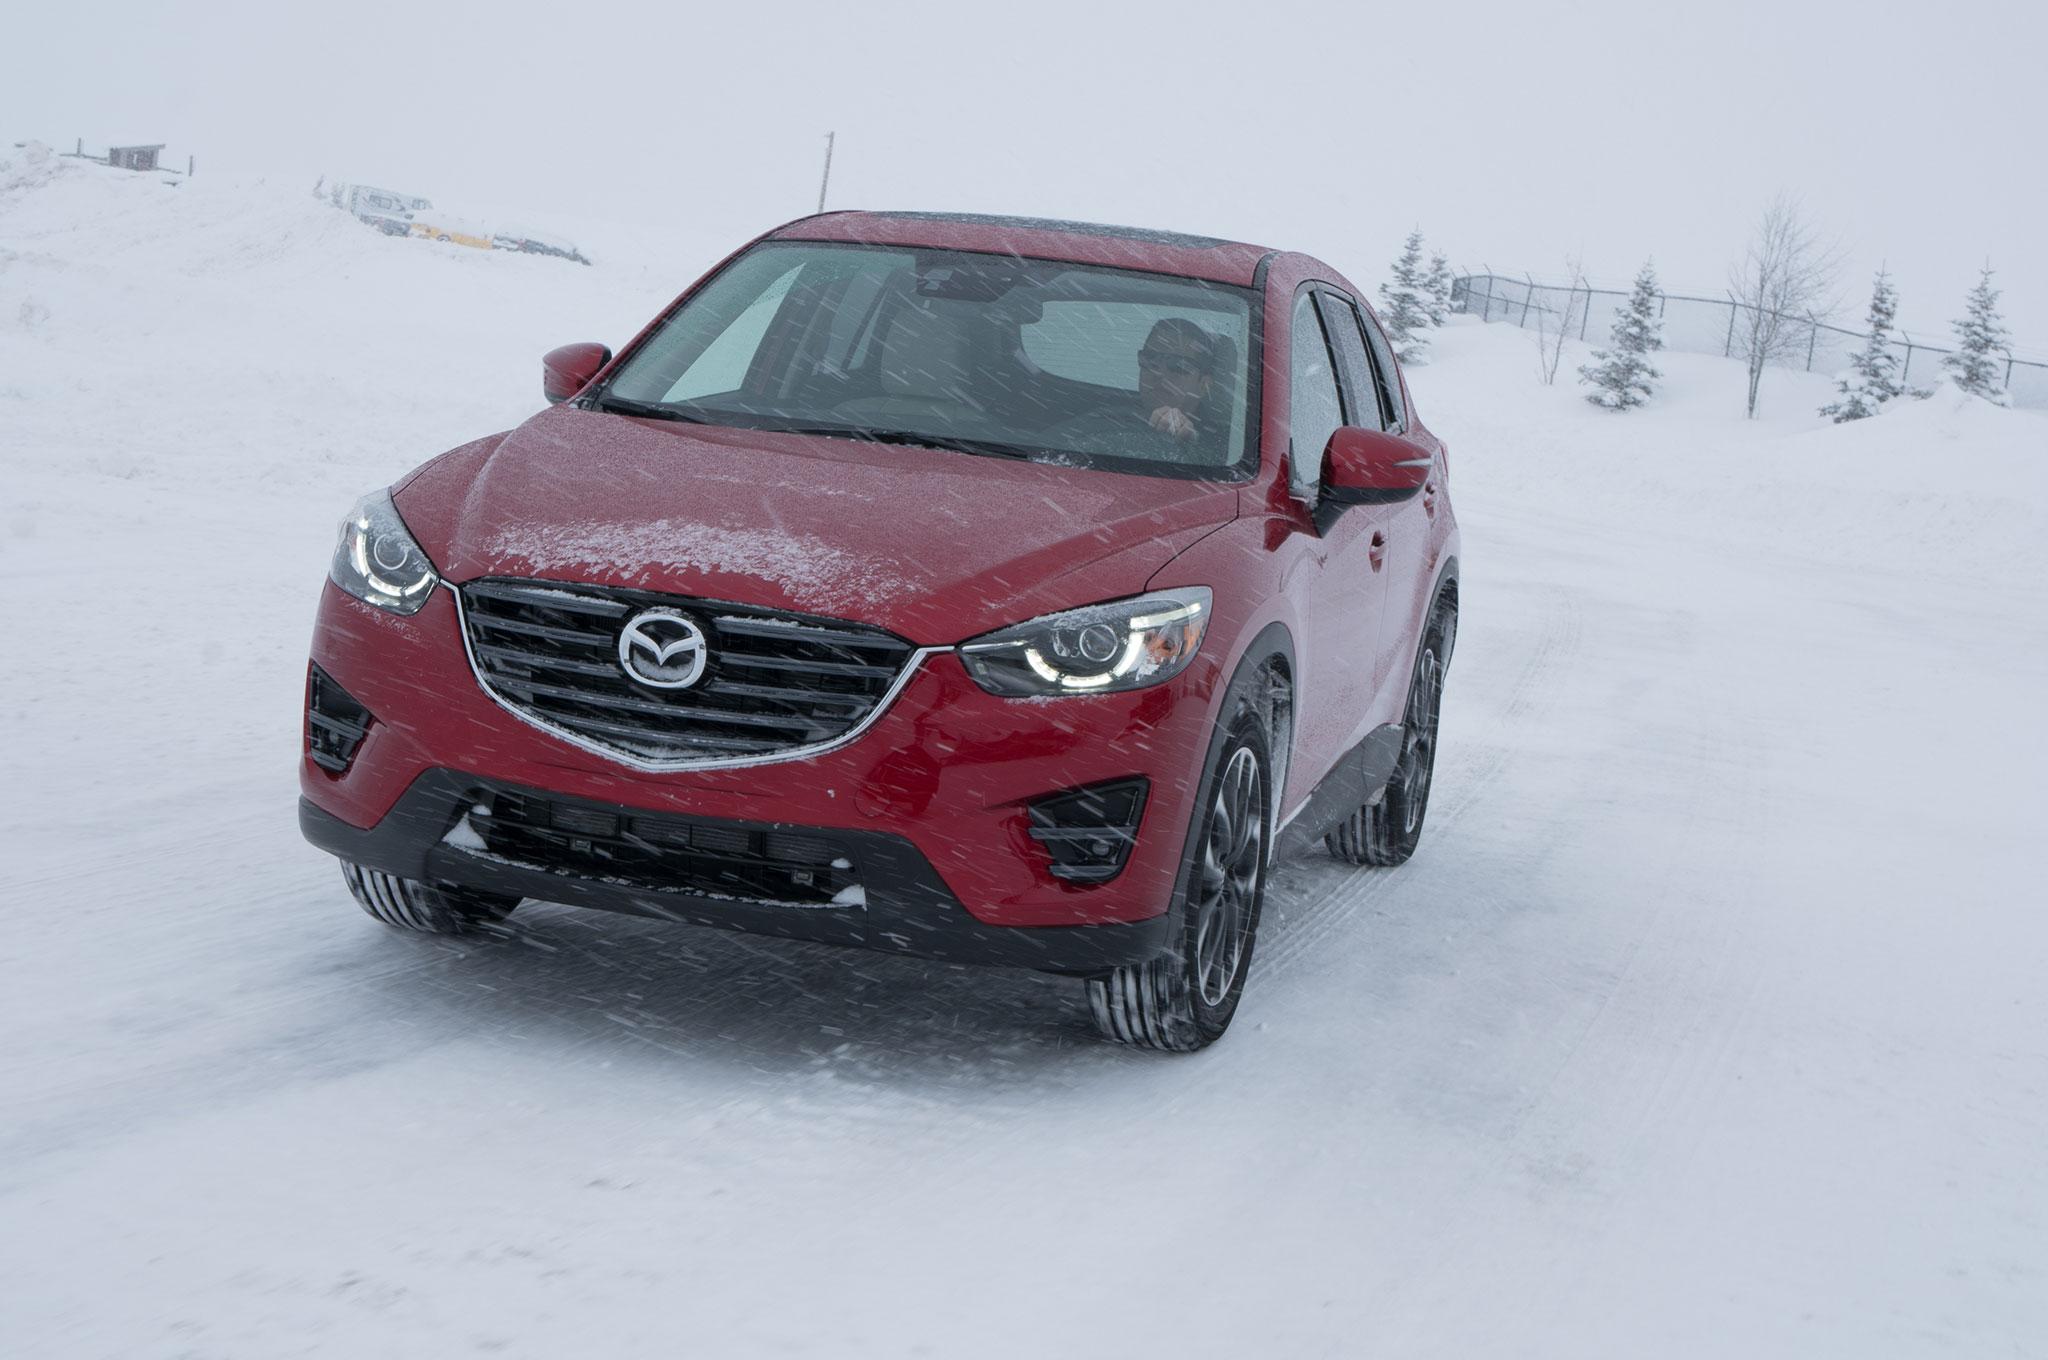 driving the mazda cx-3, cx-5, and mx-5 miata on snow and ice